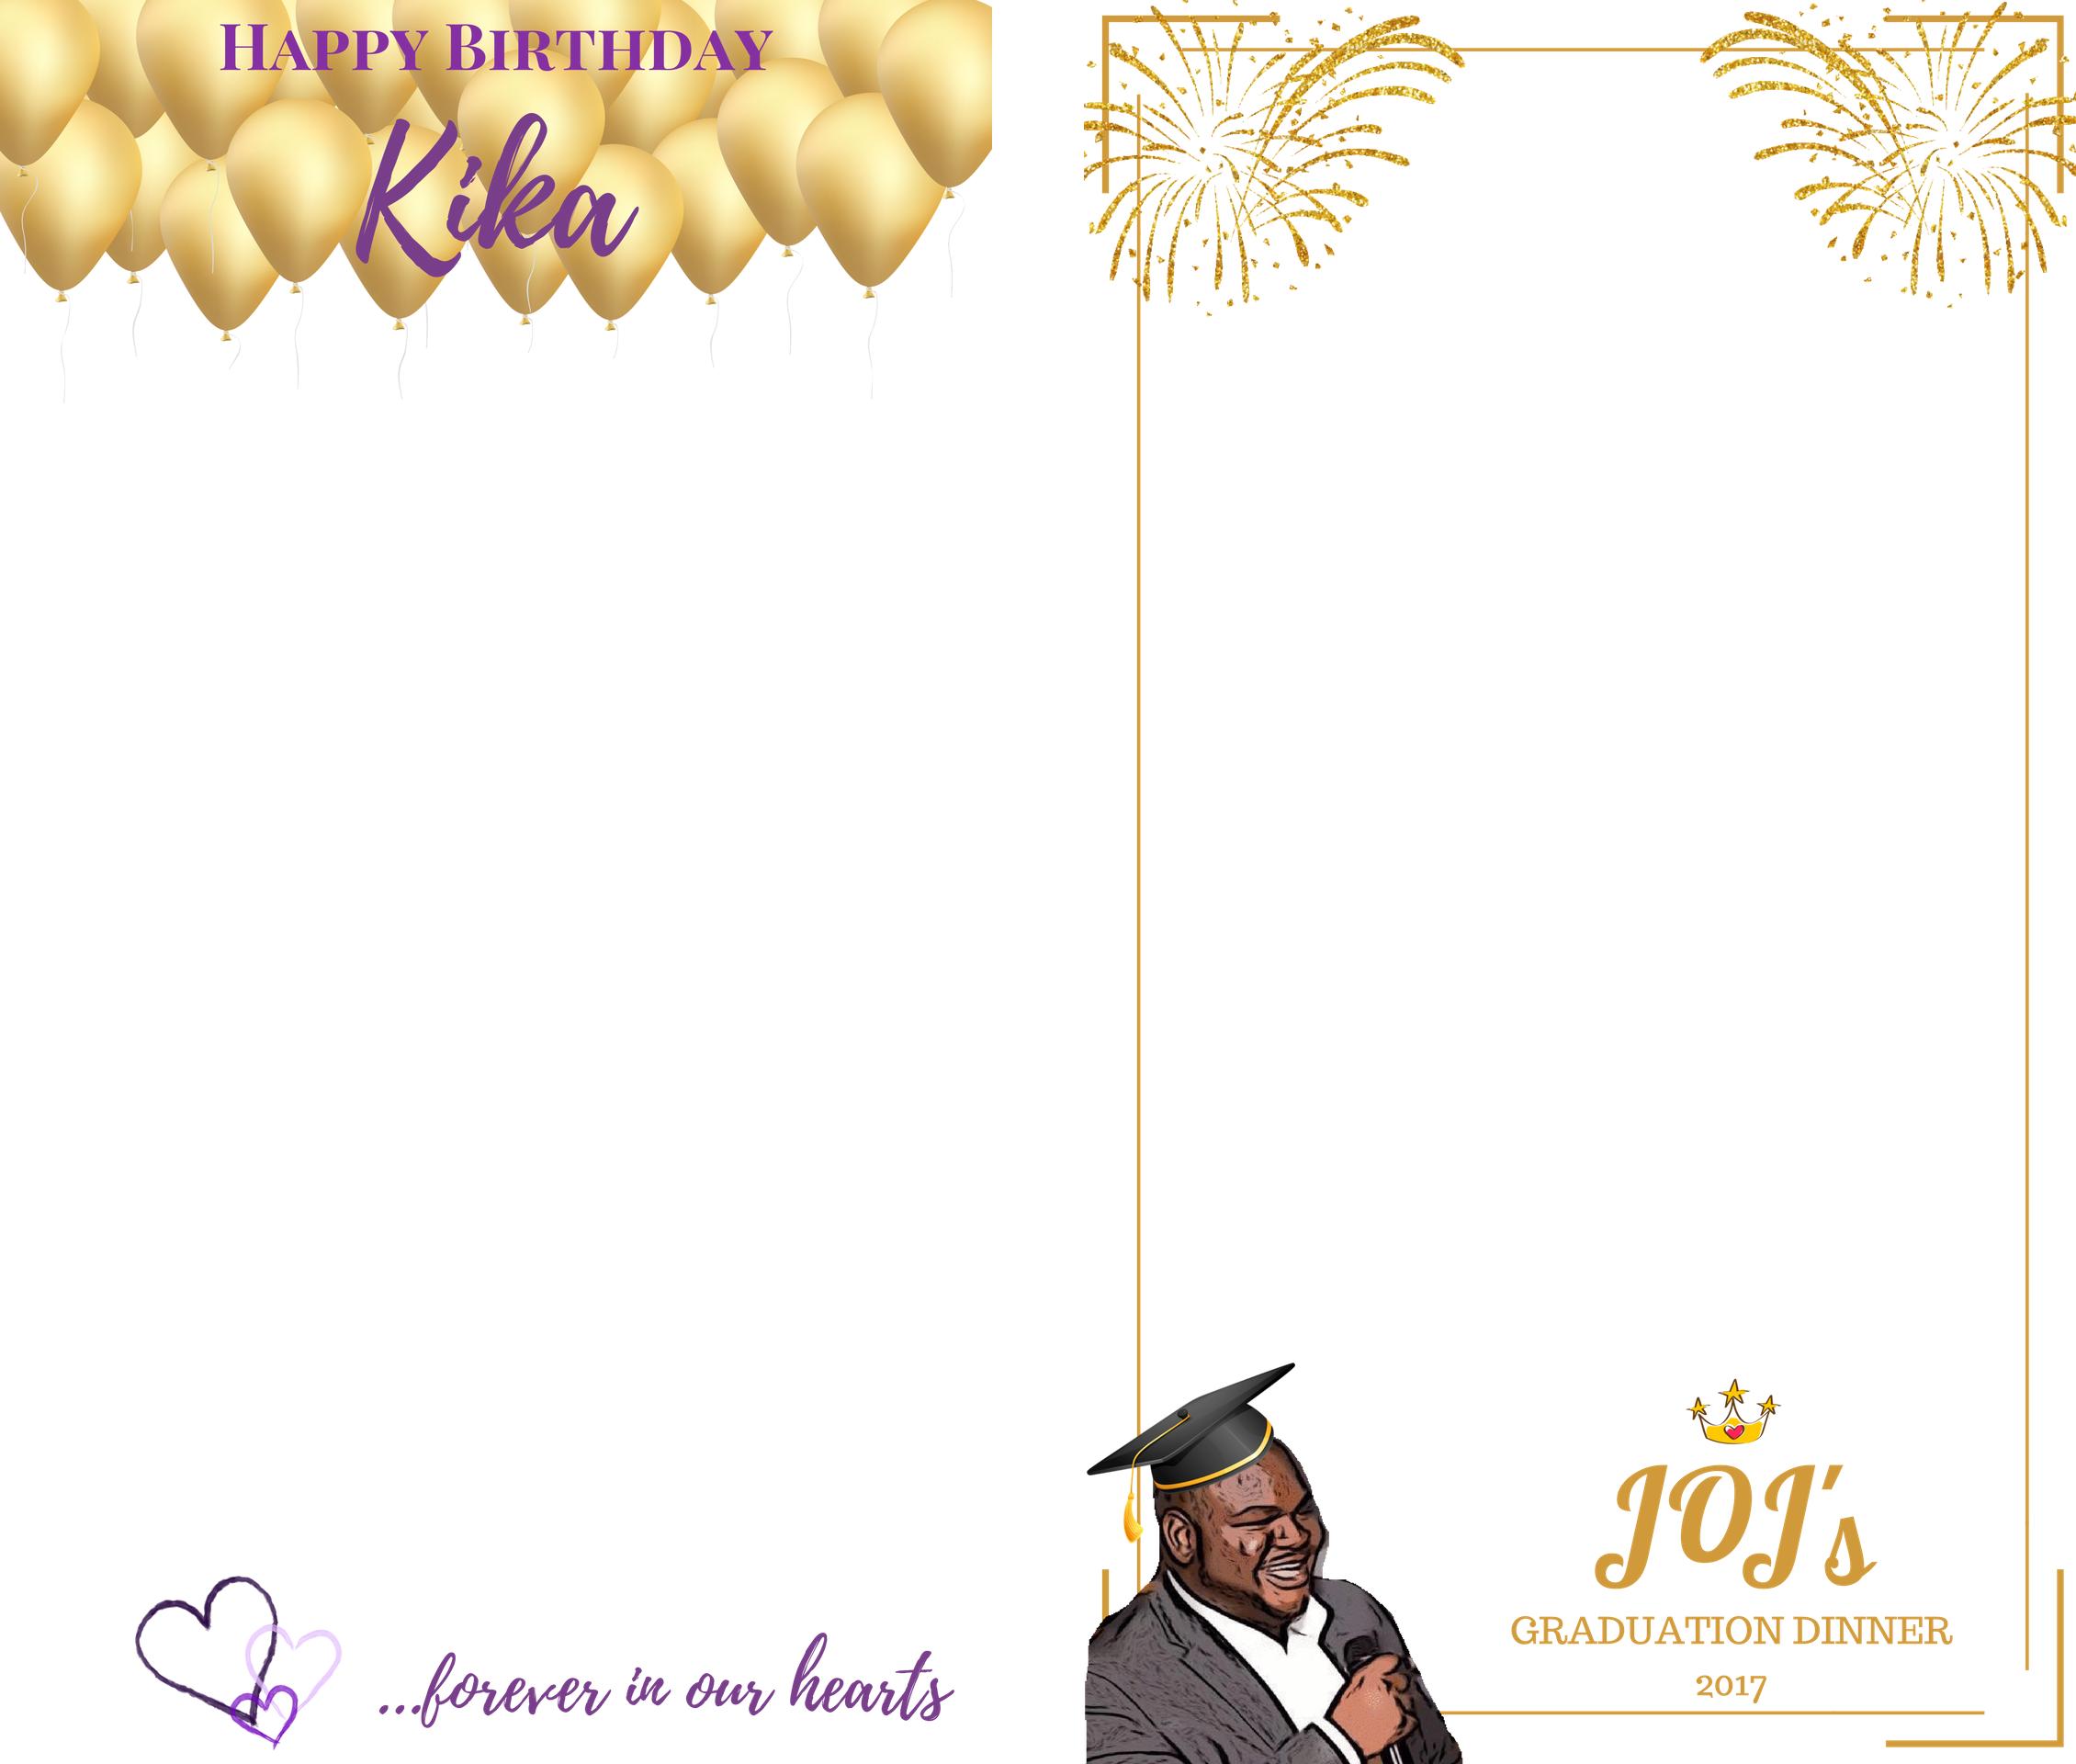 HBD Kika//JOJ's Graduation